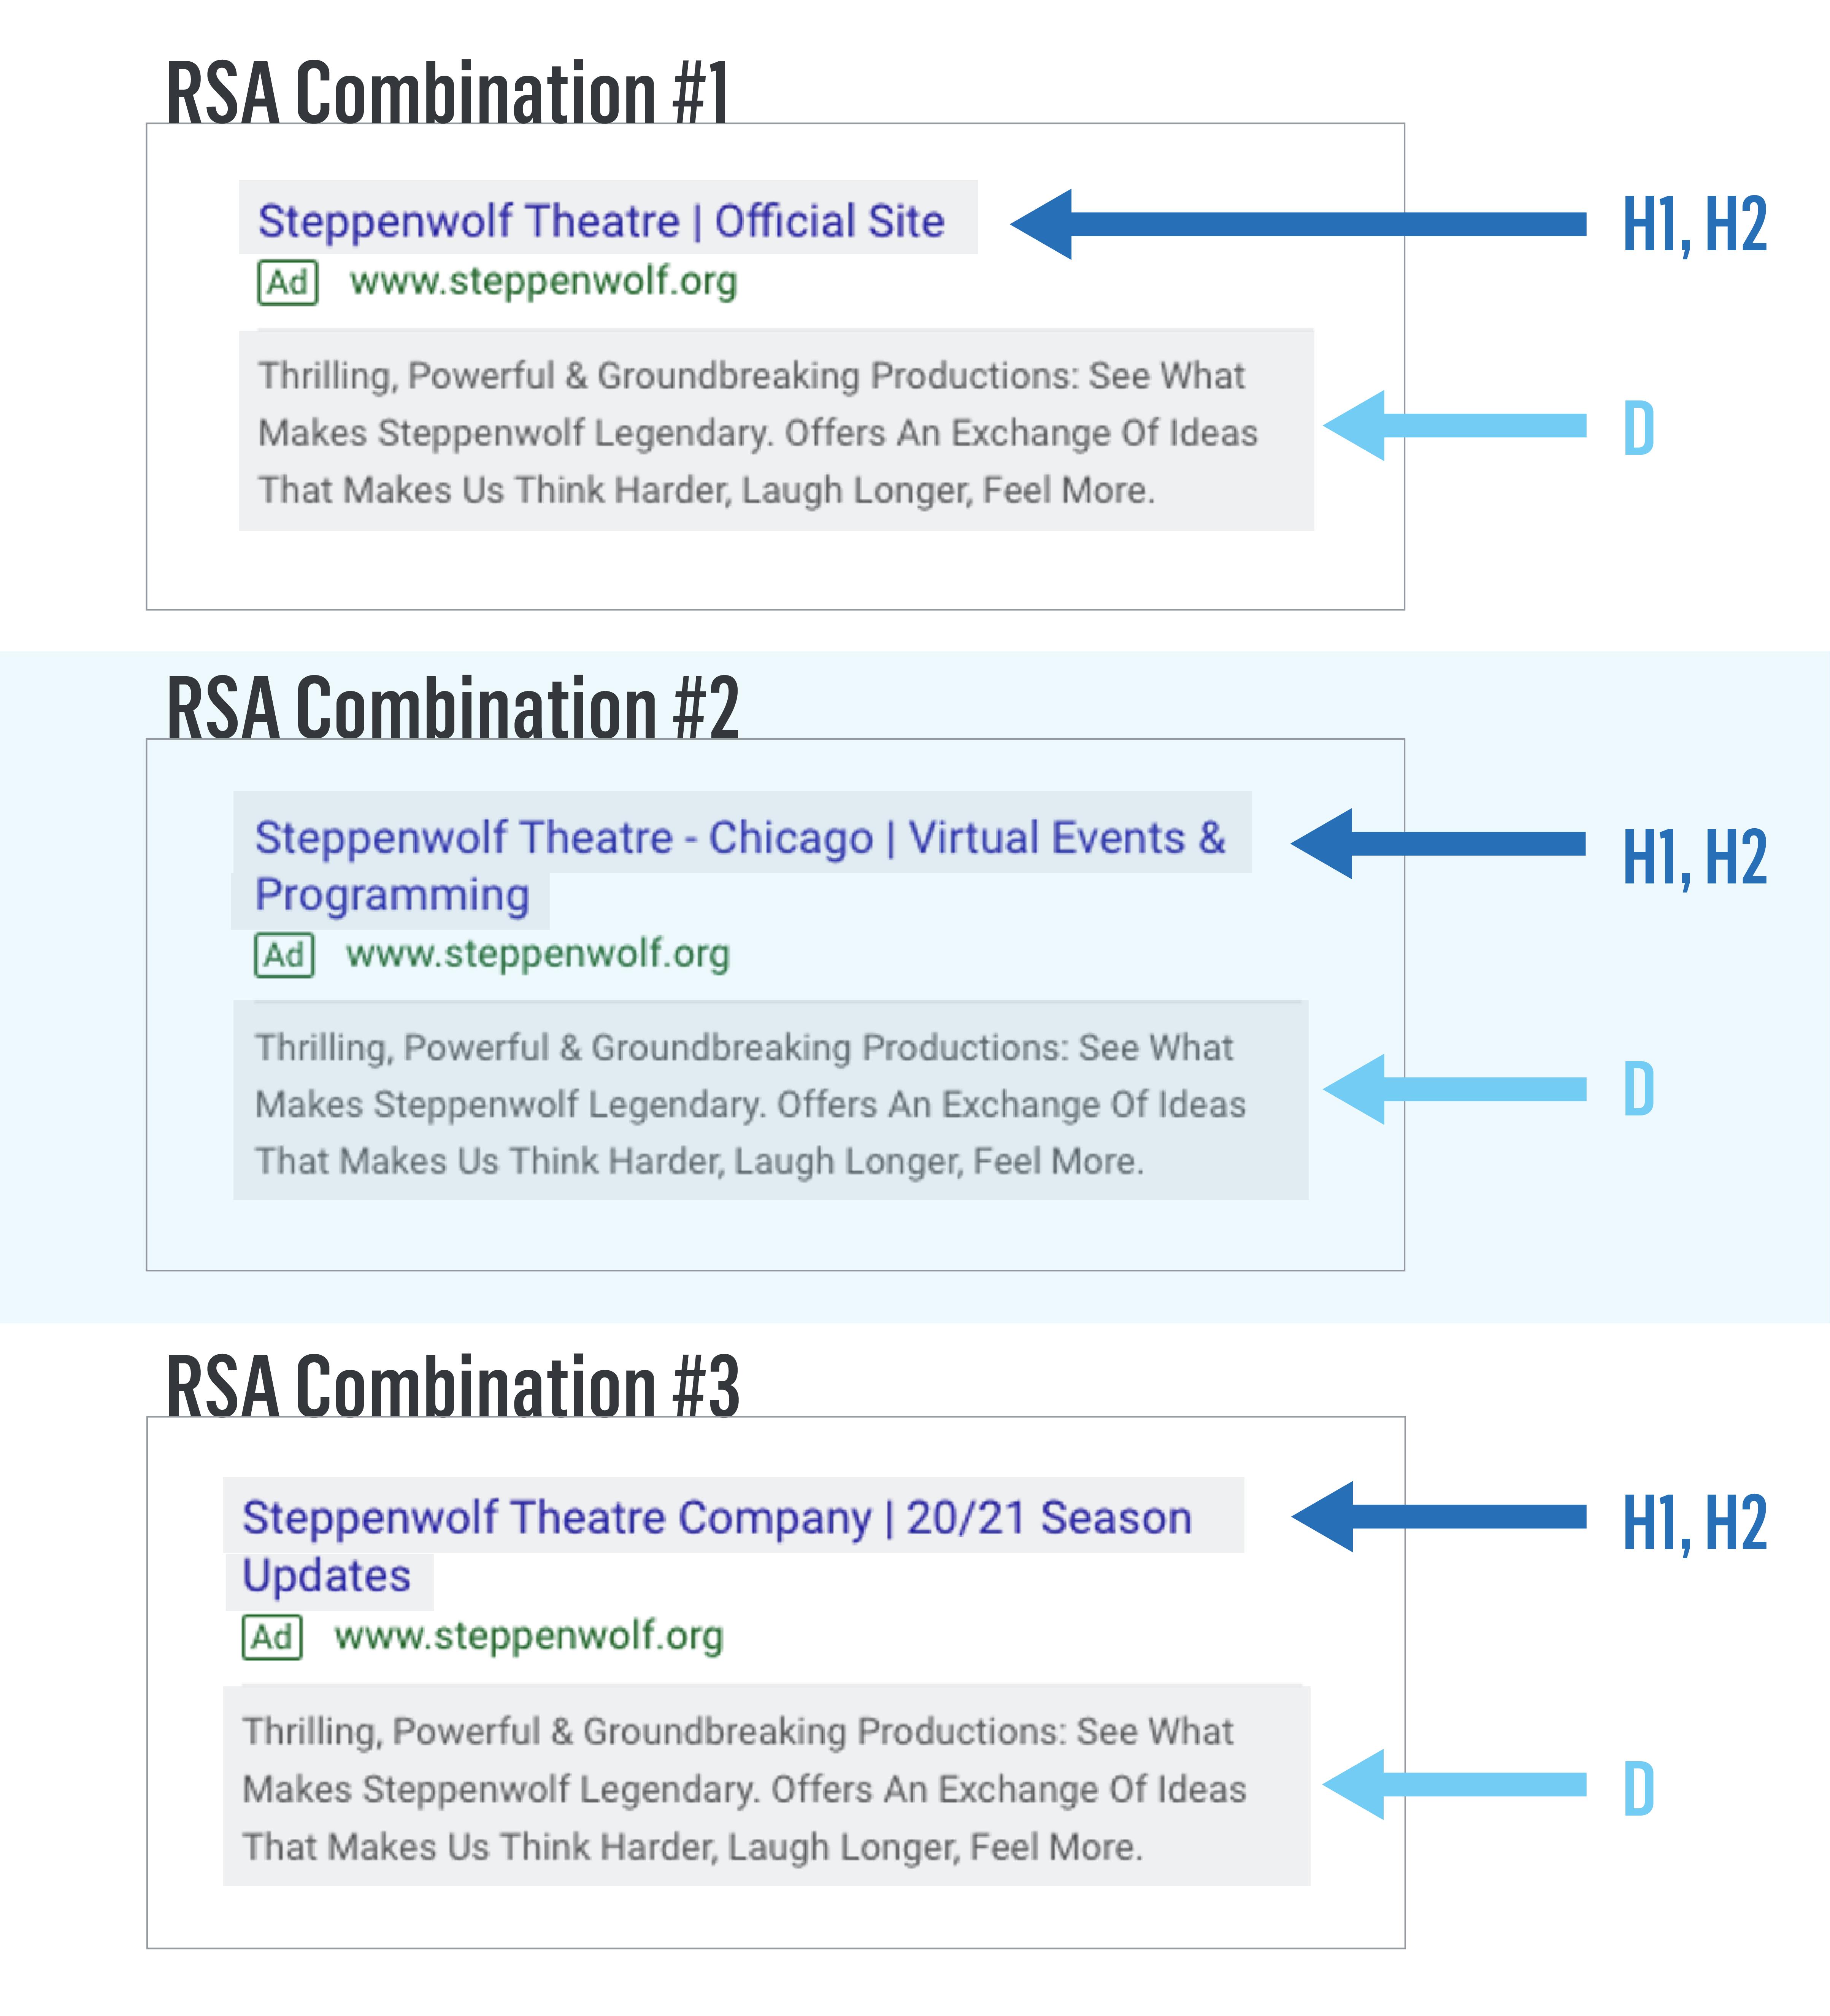 RSA Combinations